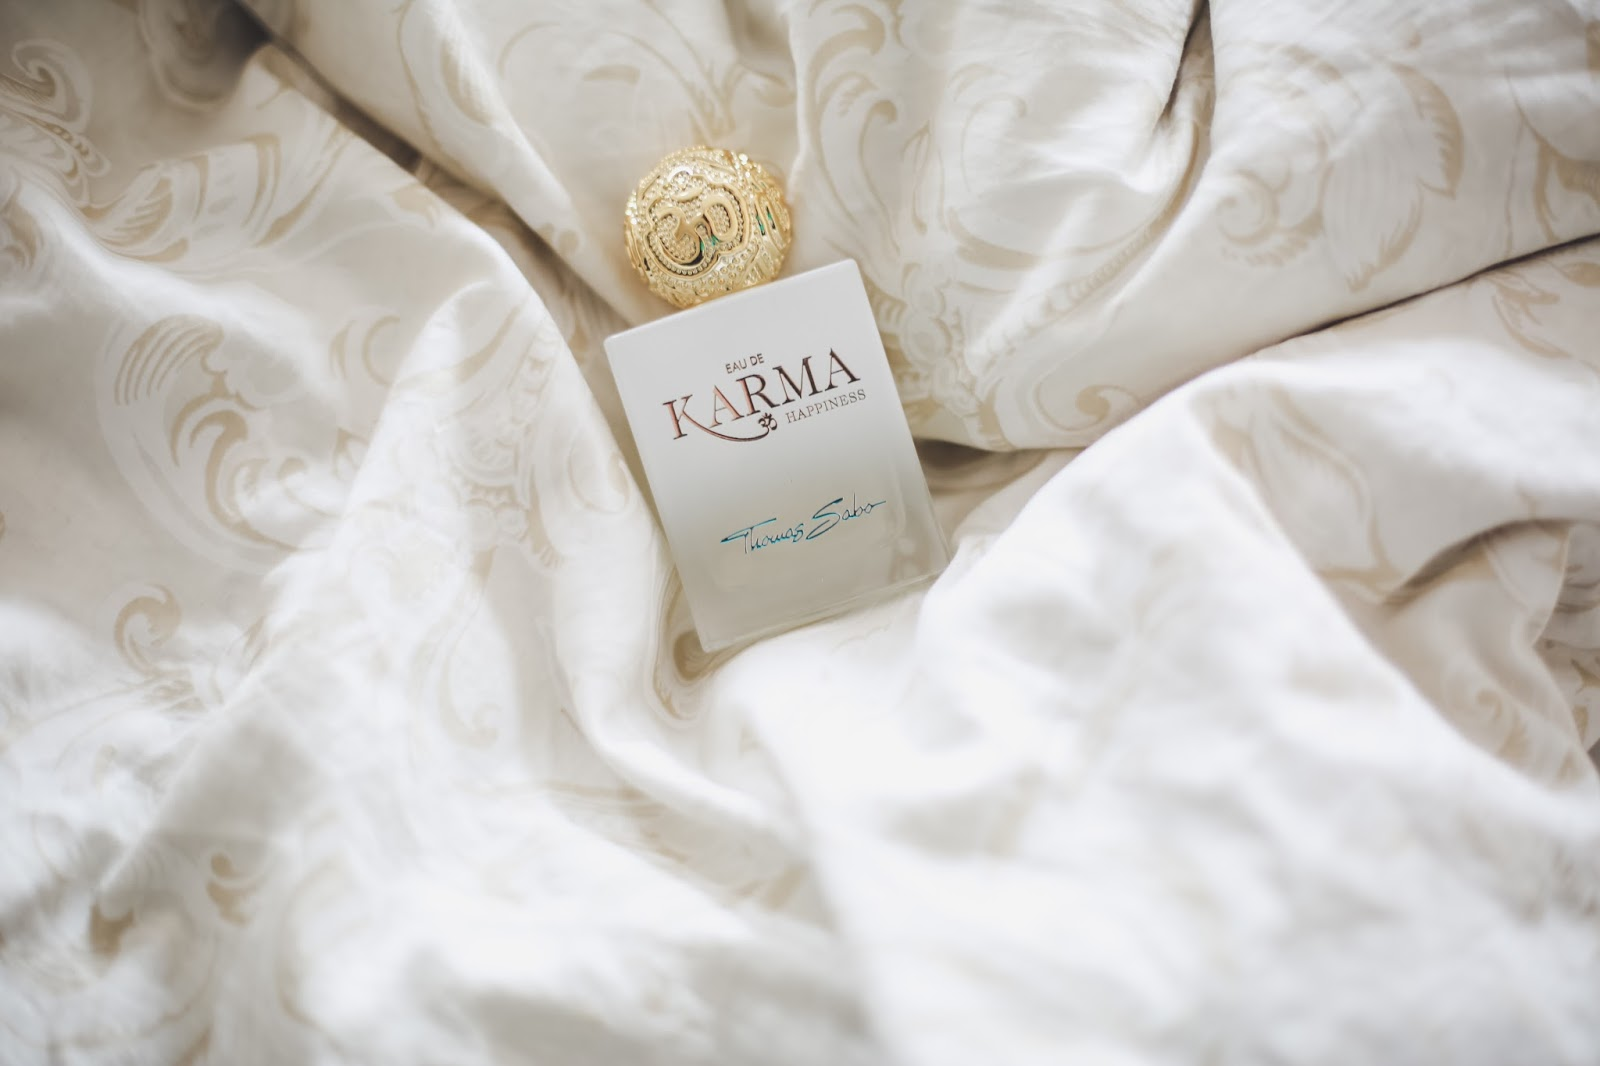 Parfum Eau de Karma Happiness Thomas Sabo